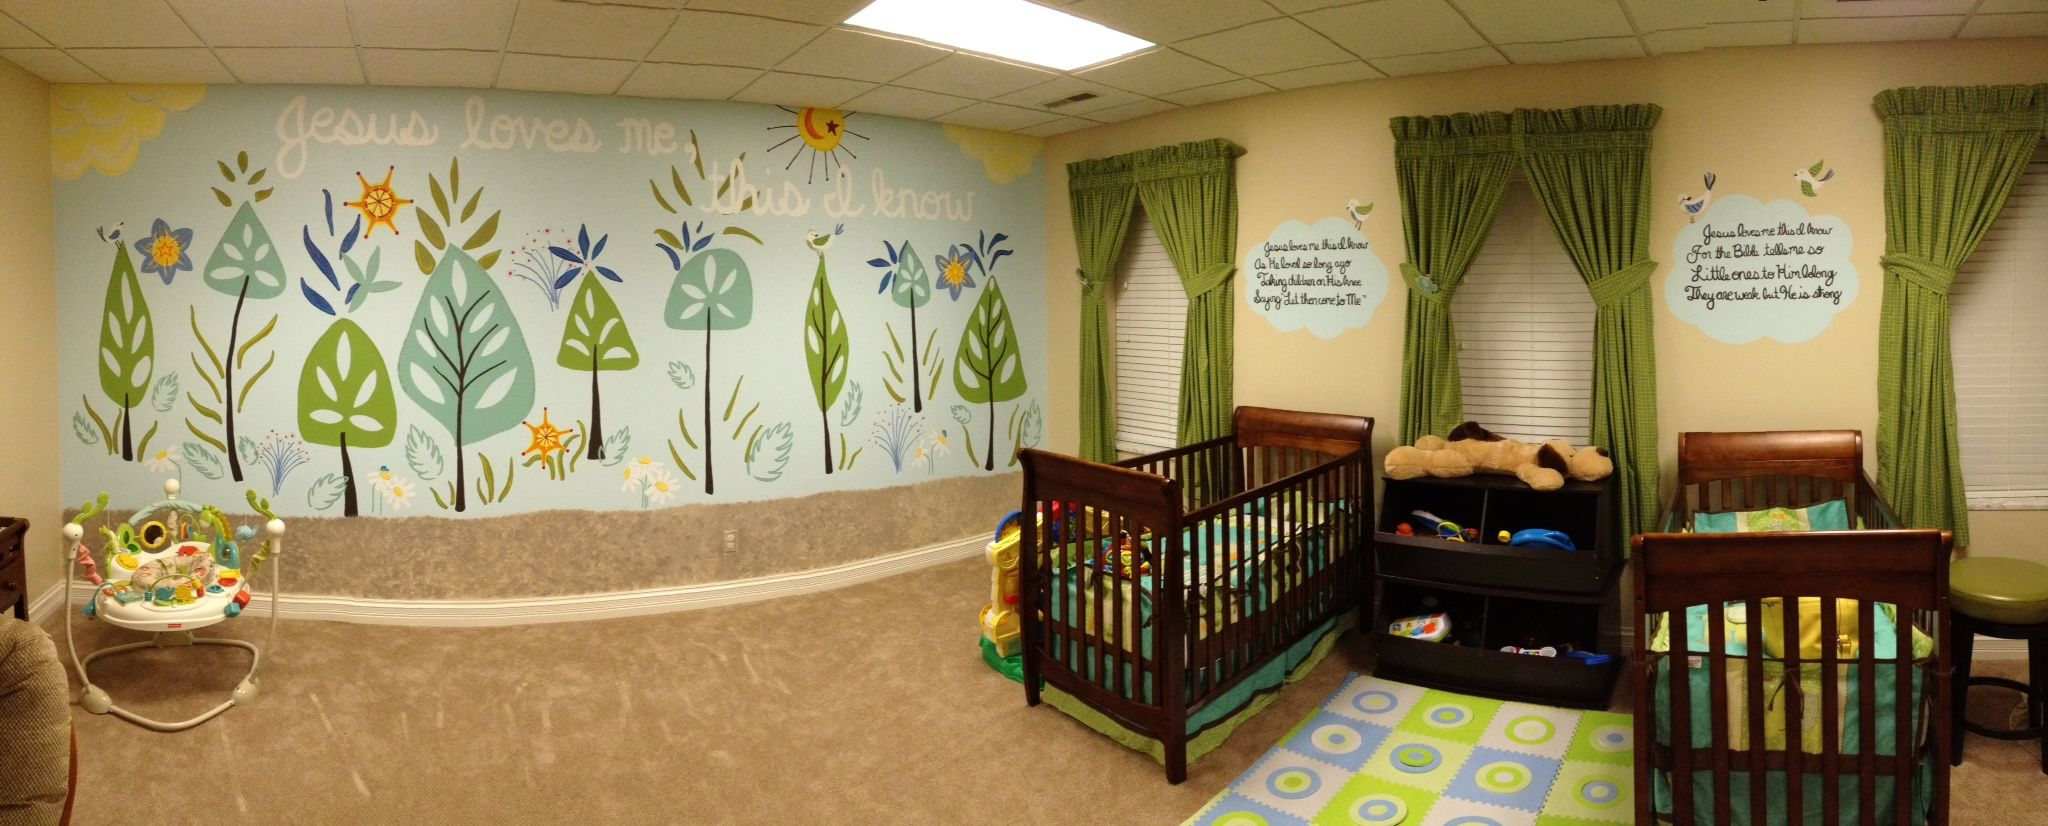 Church Nursery Decor Online